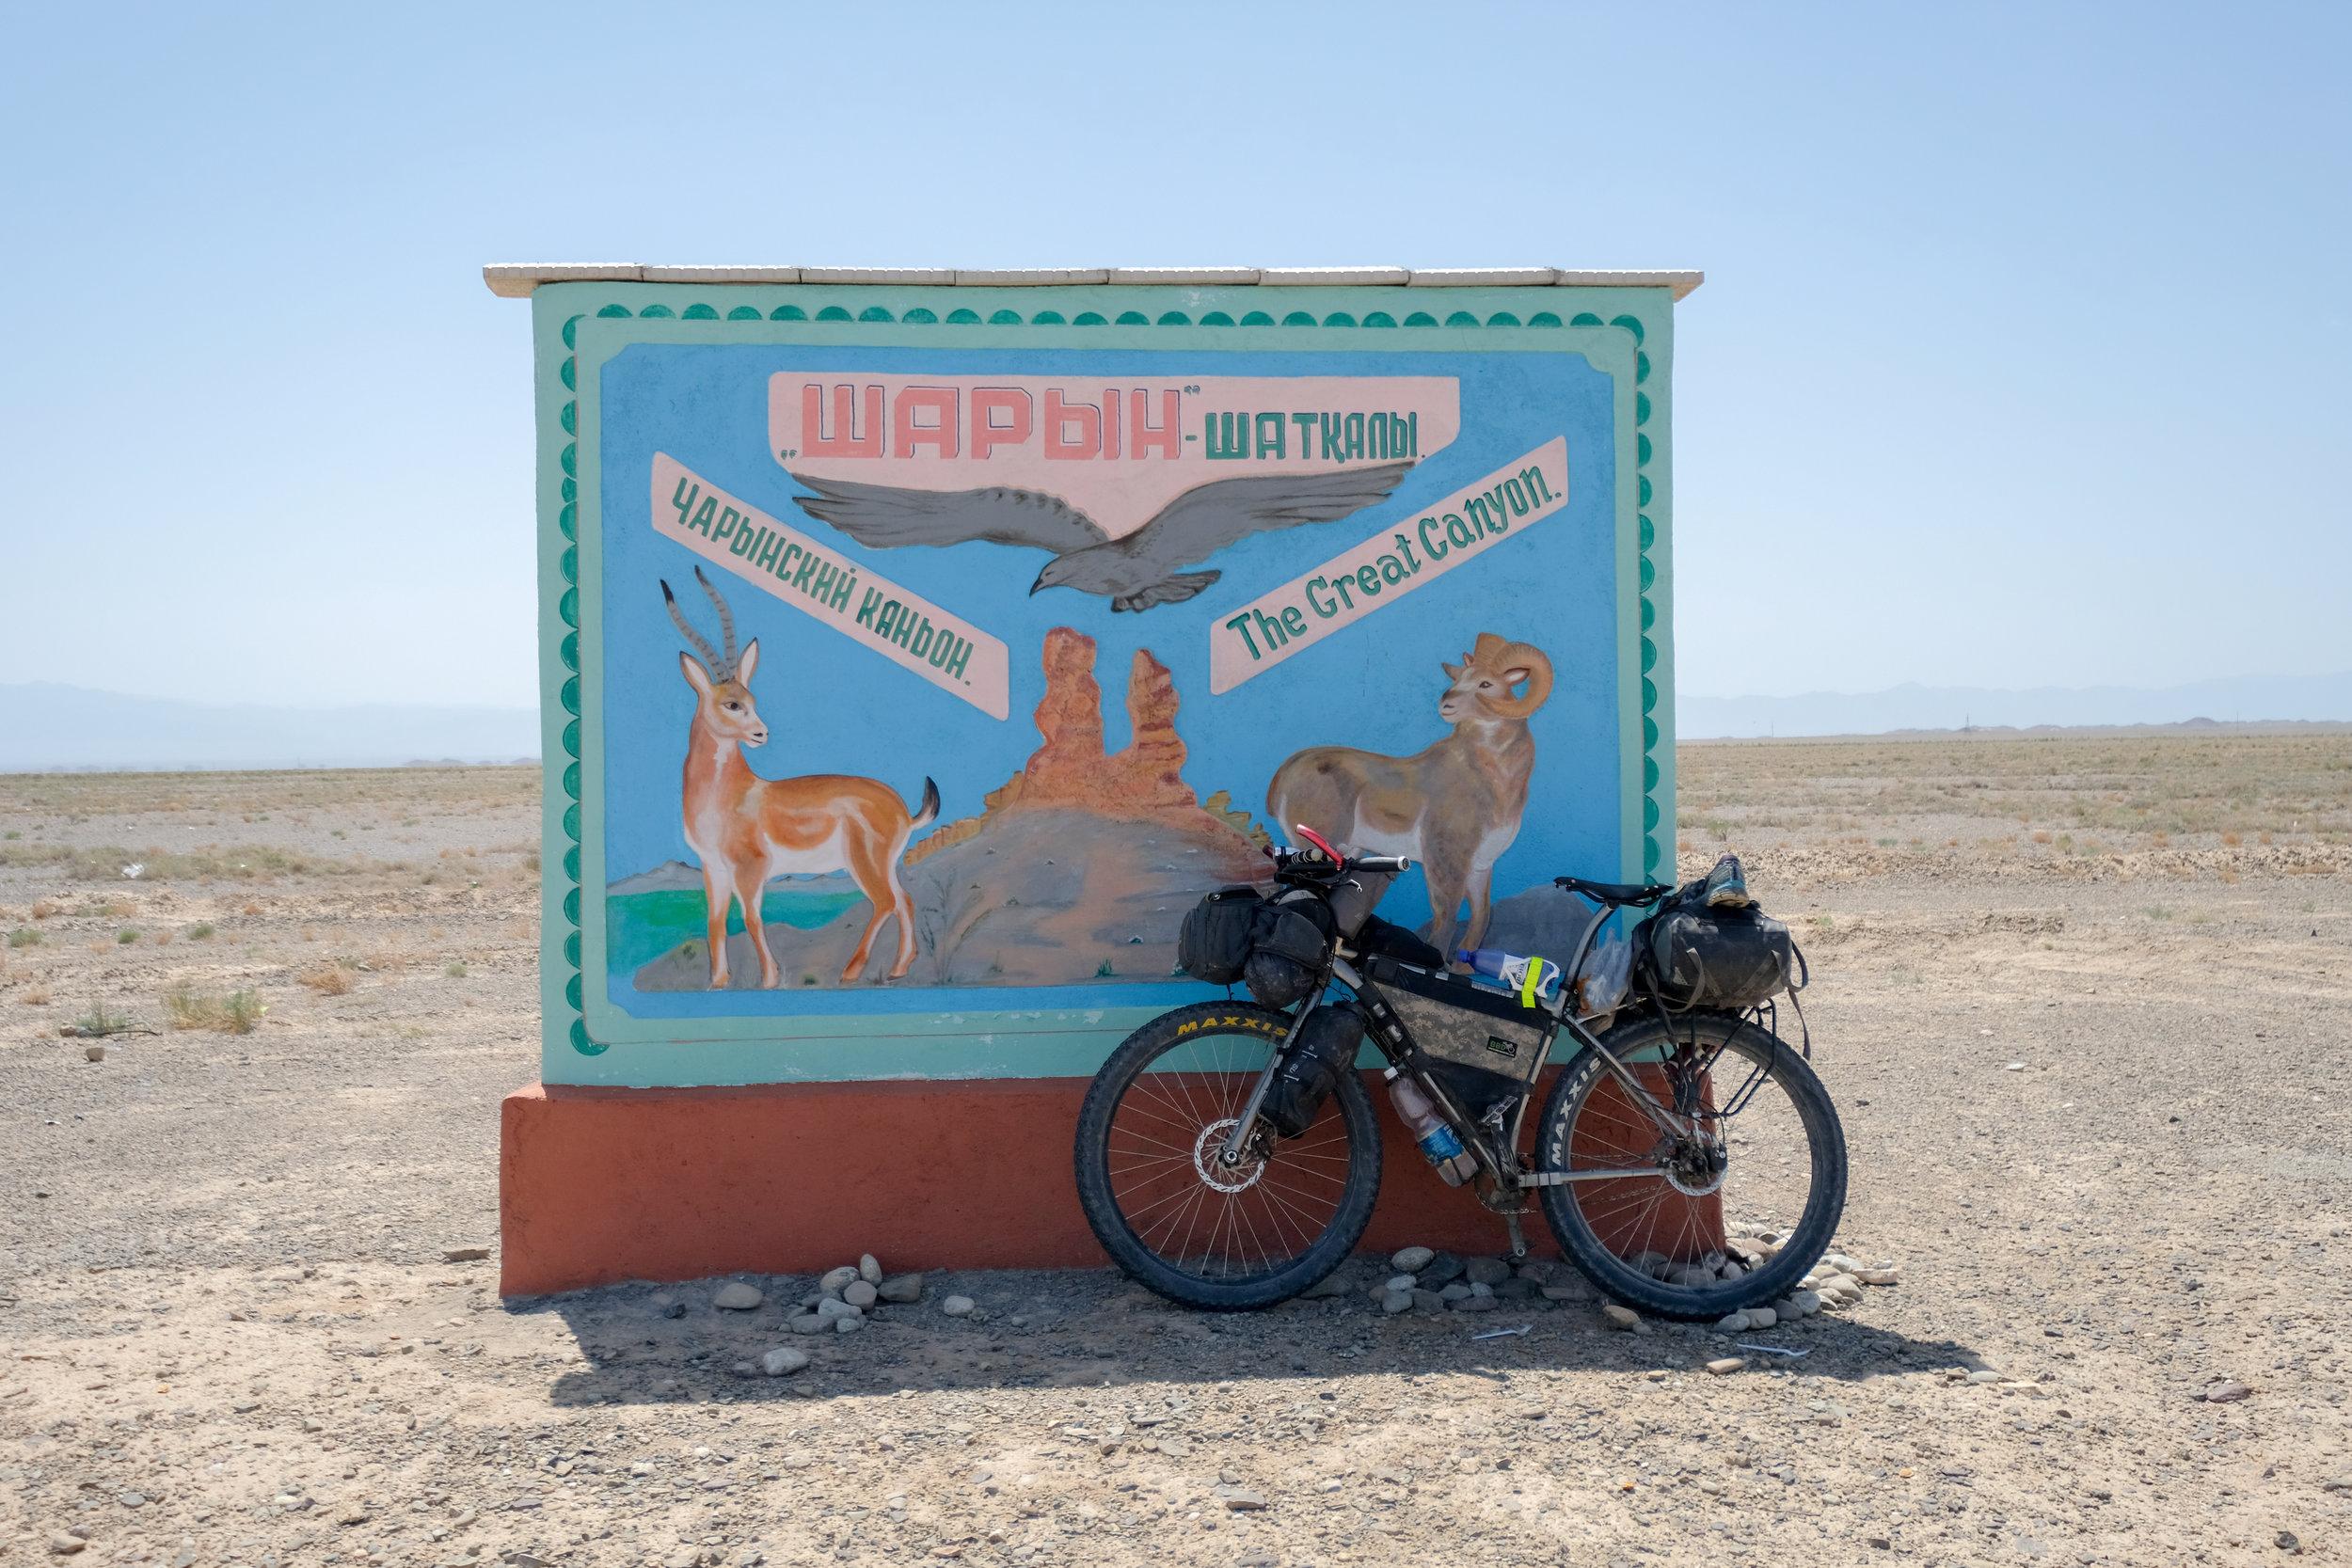 kazakh-corner-route-4681_35480020635_o.jpg